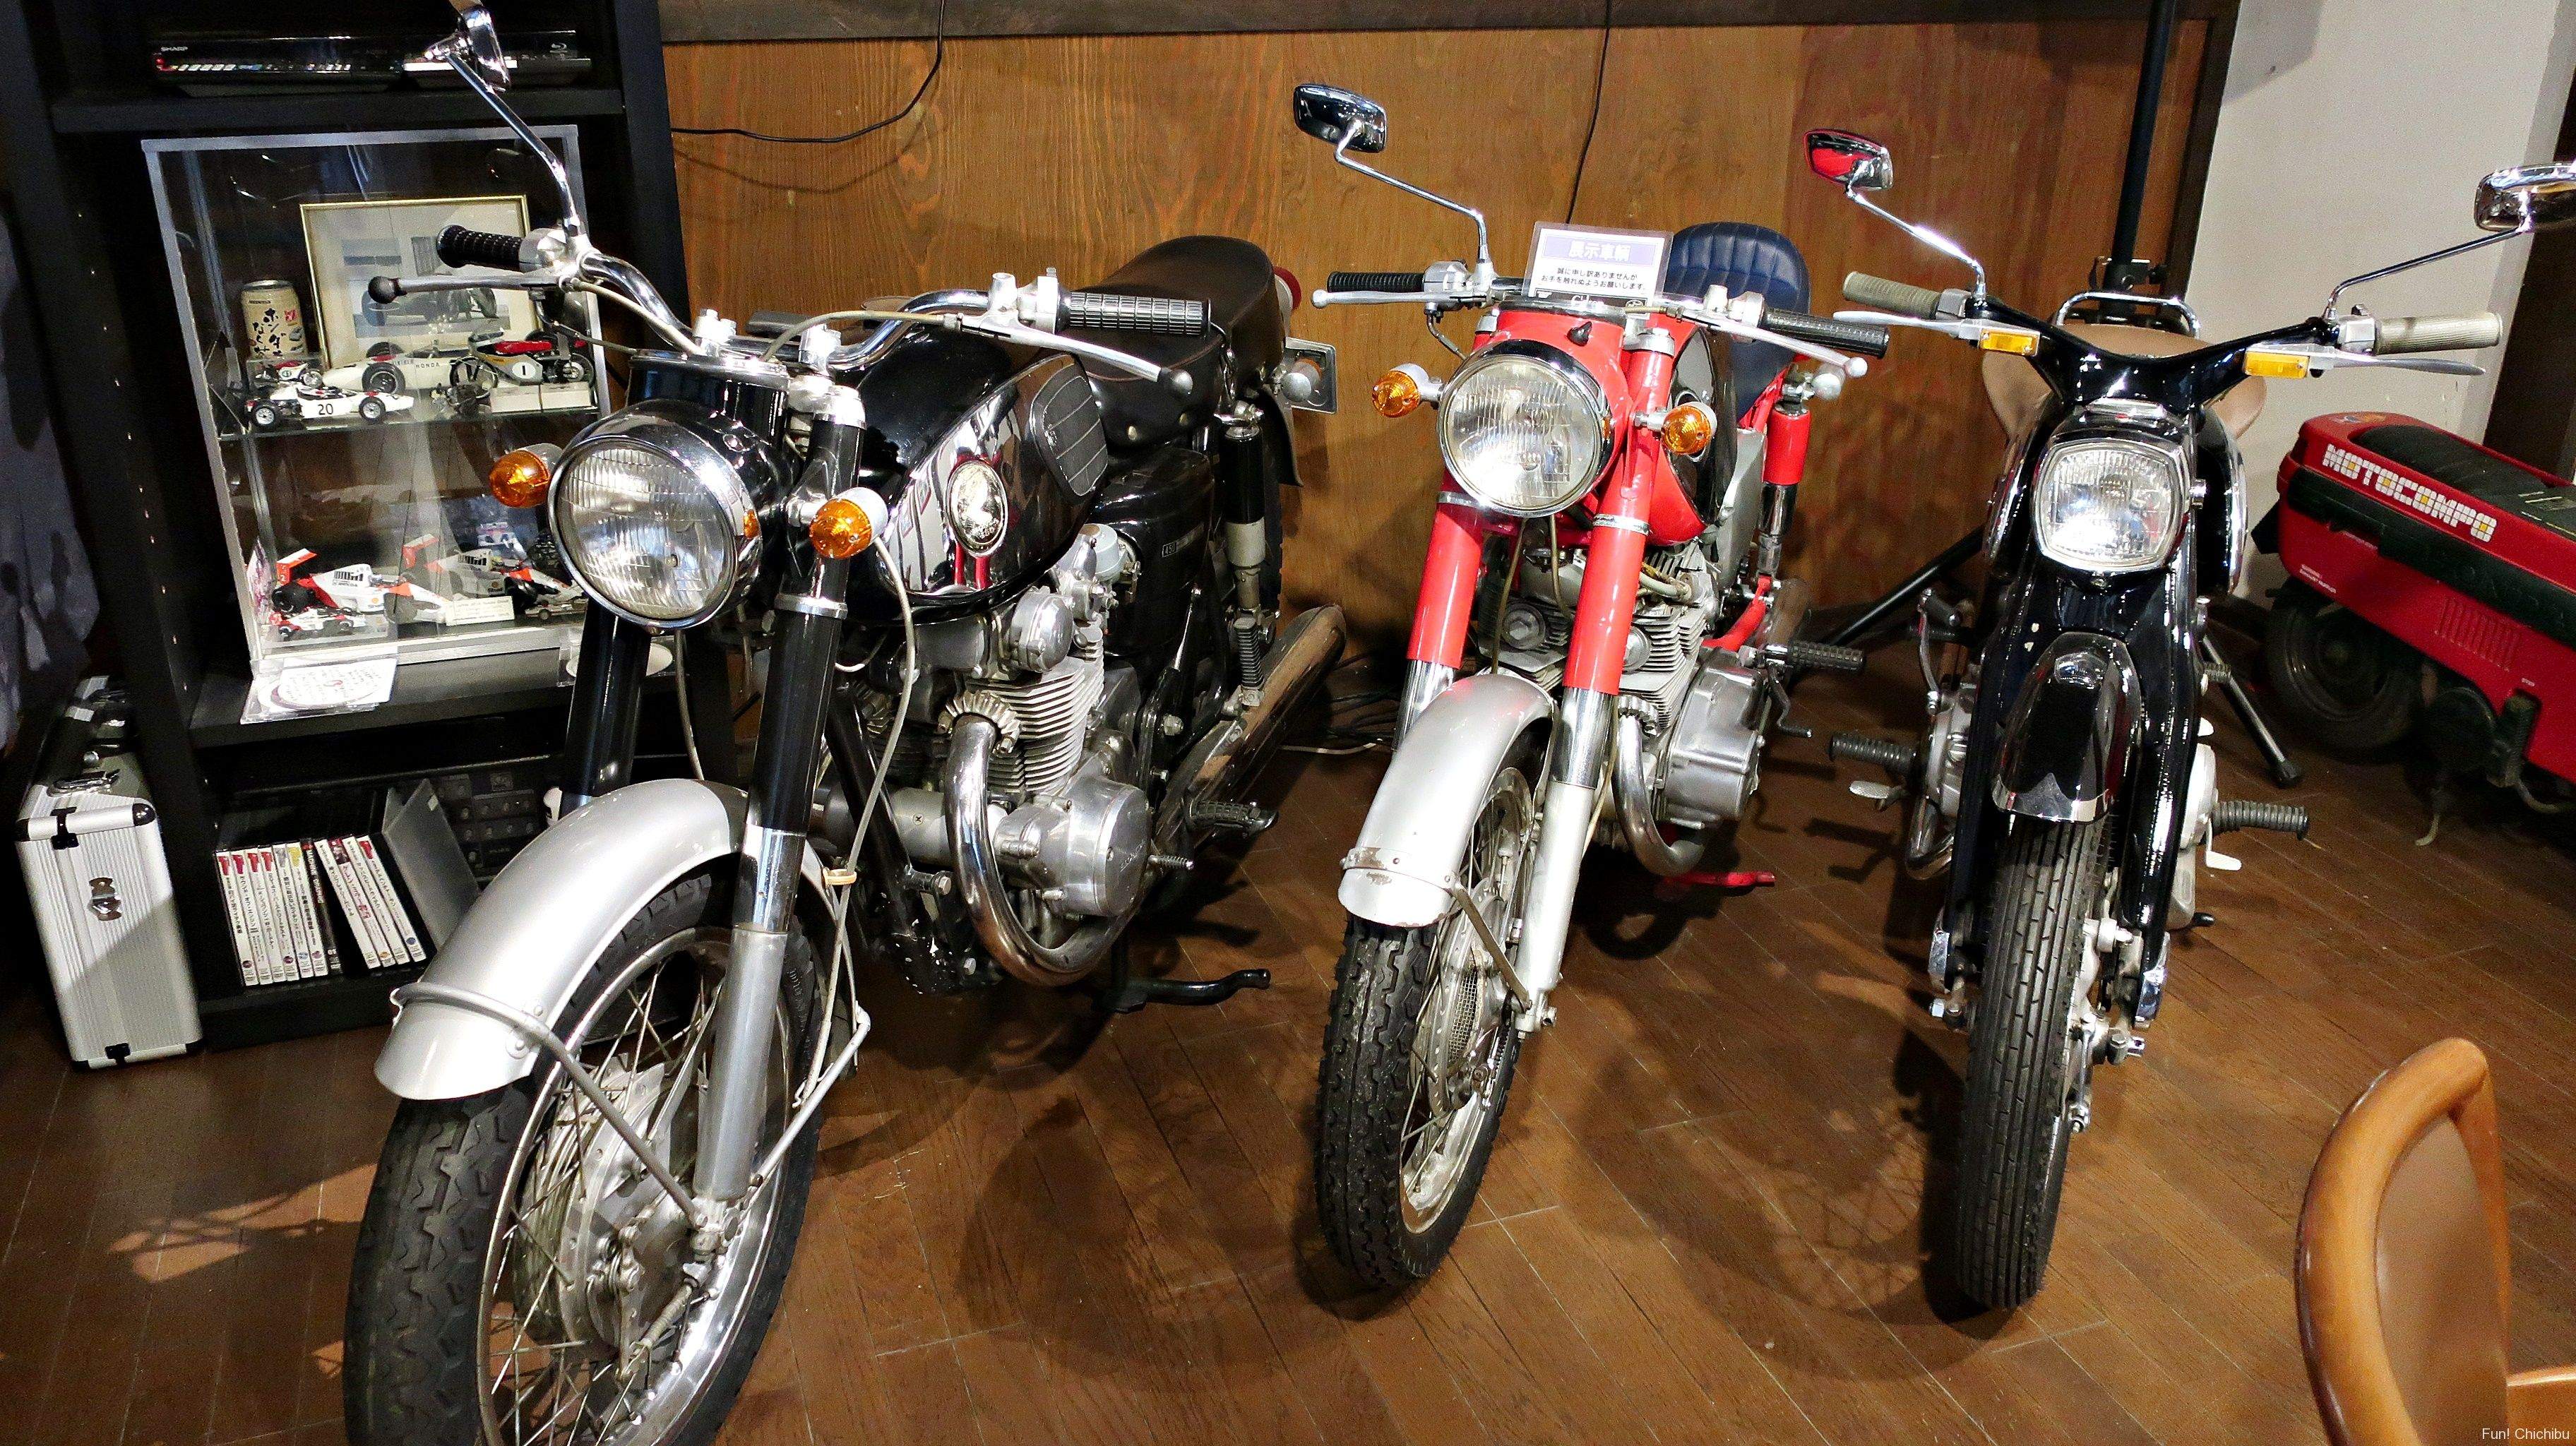 moto green cafe(モトグリーンカフェ)バイク